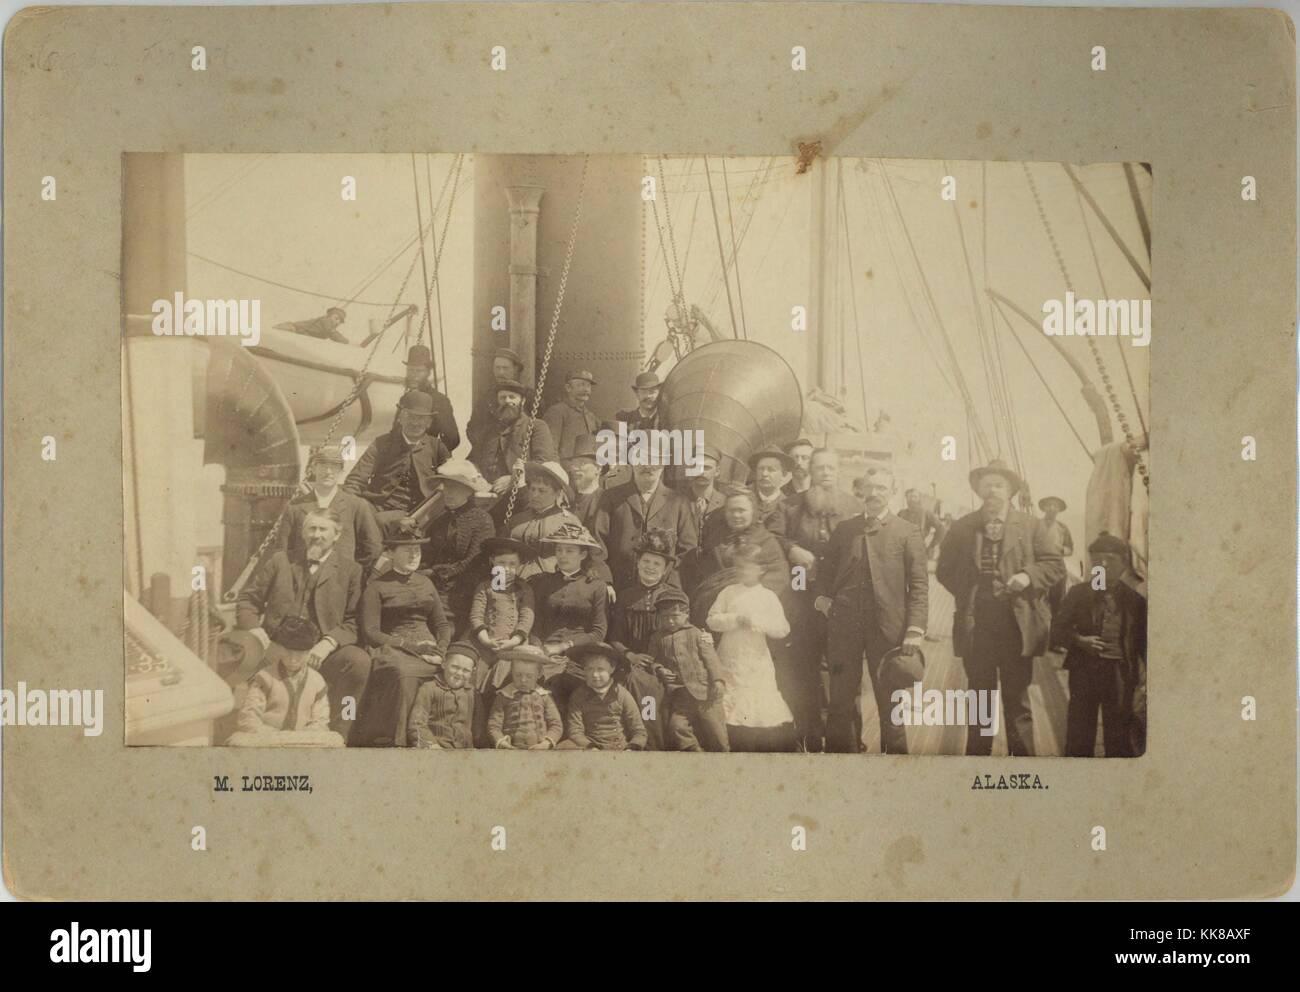 Passengers aboard ship to Alaska, Photograph by M Lorenz